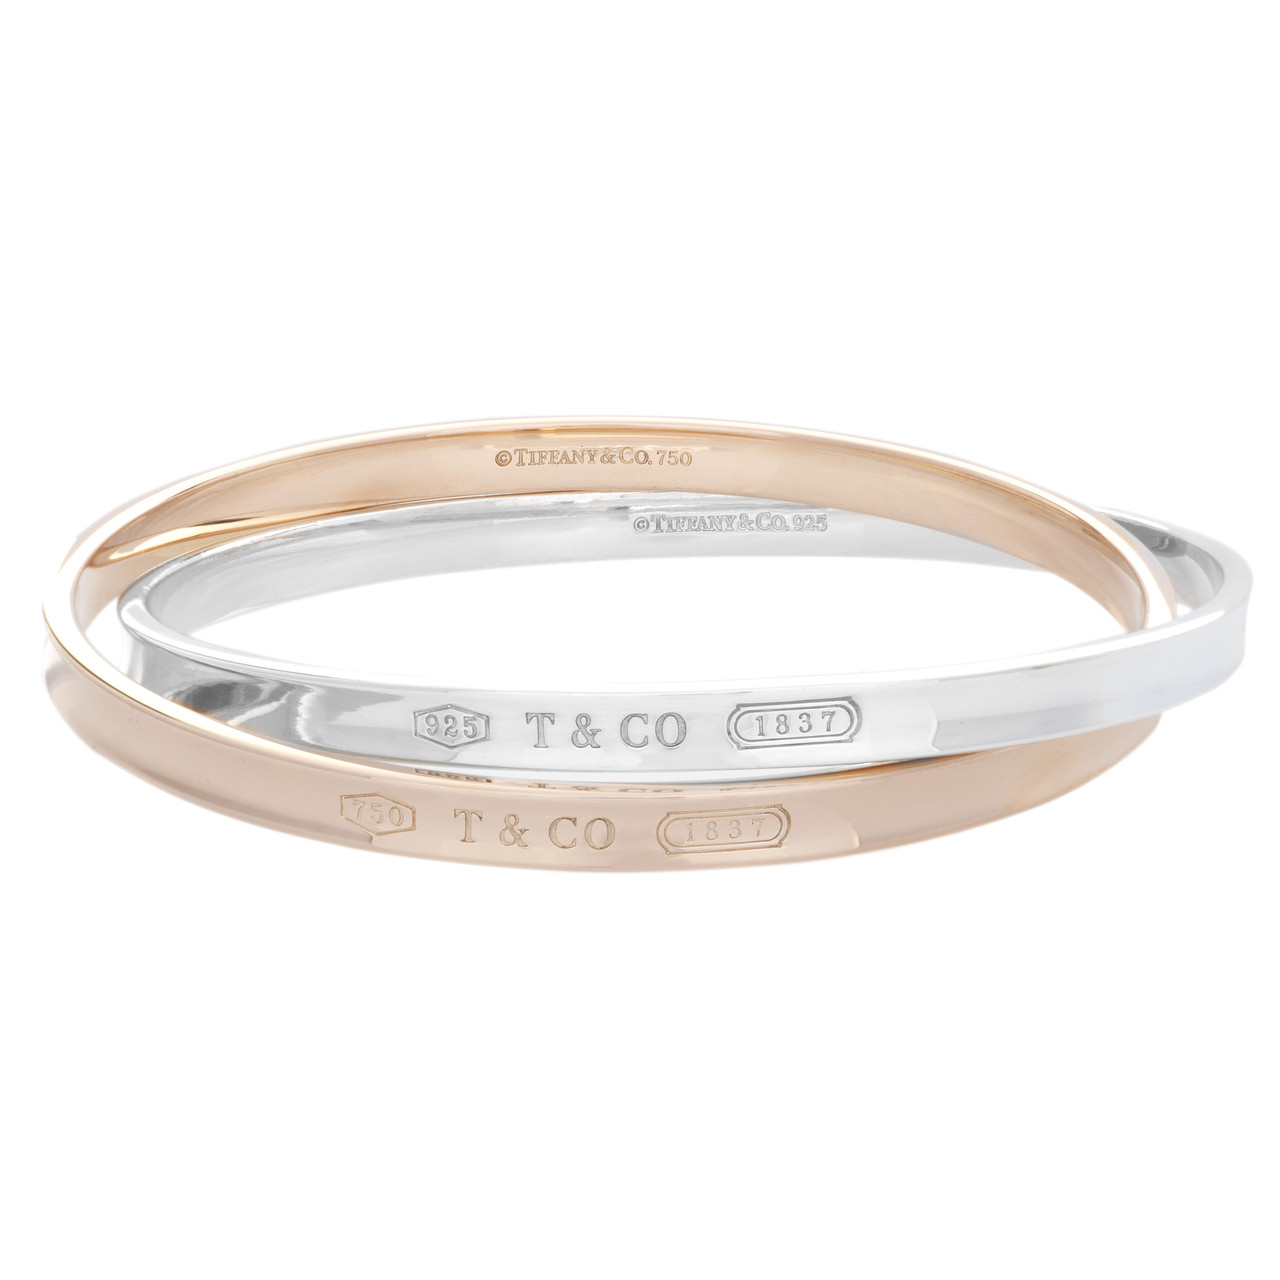 ea6efa7d1 Tiffany & Co. 18K Rose Gold & Sterling Silver Interlocking Circles ...